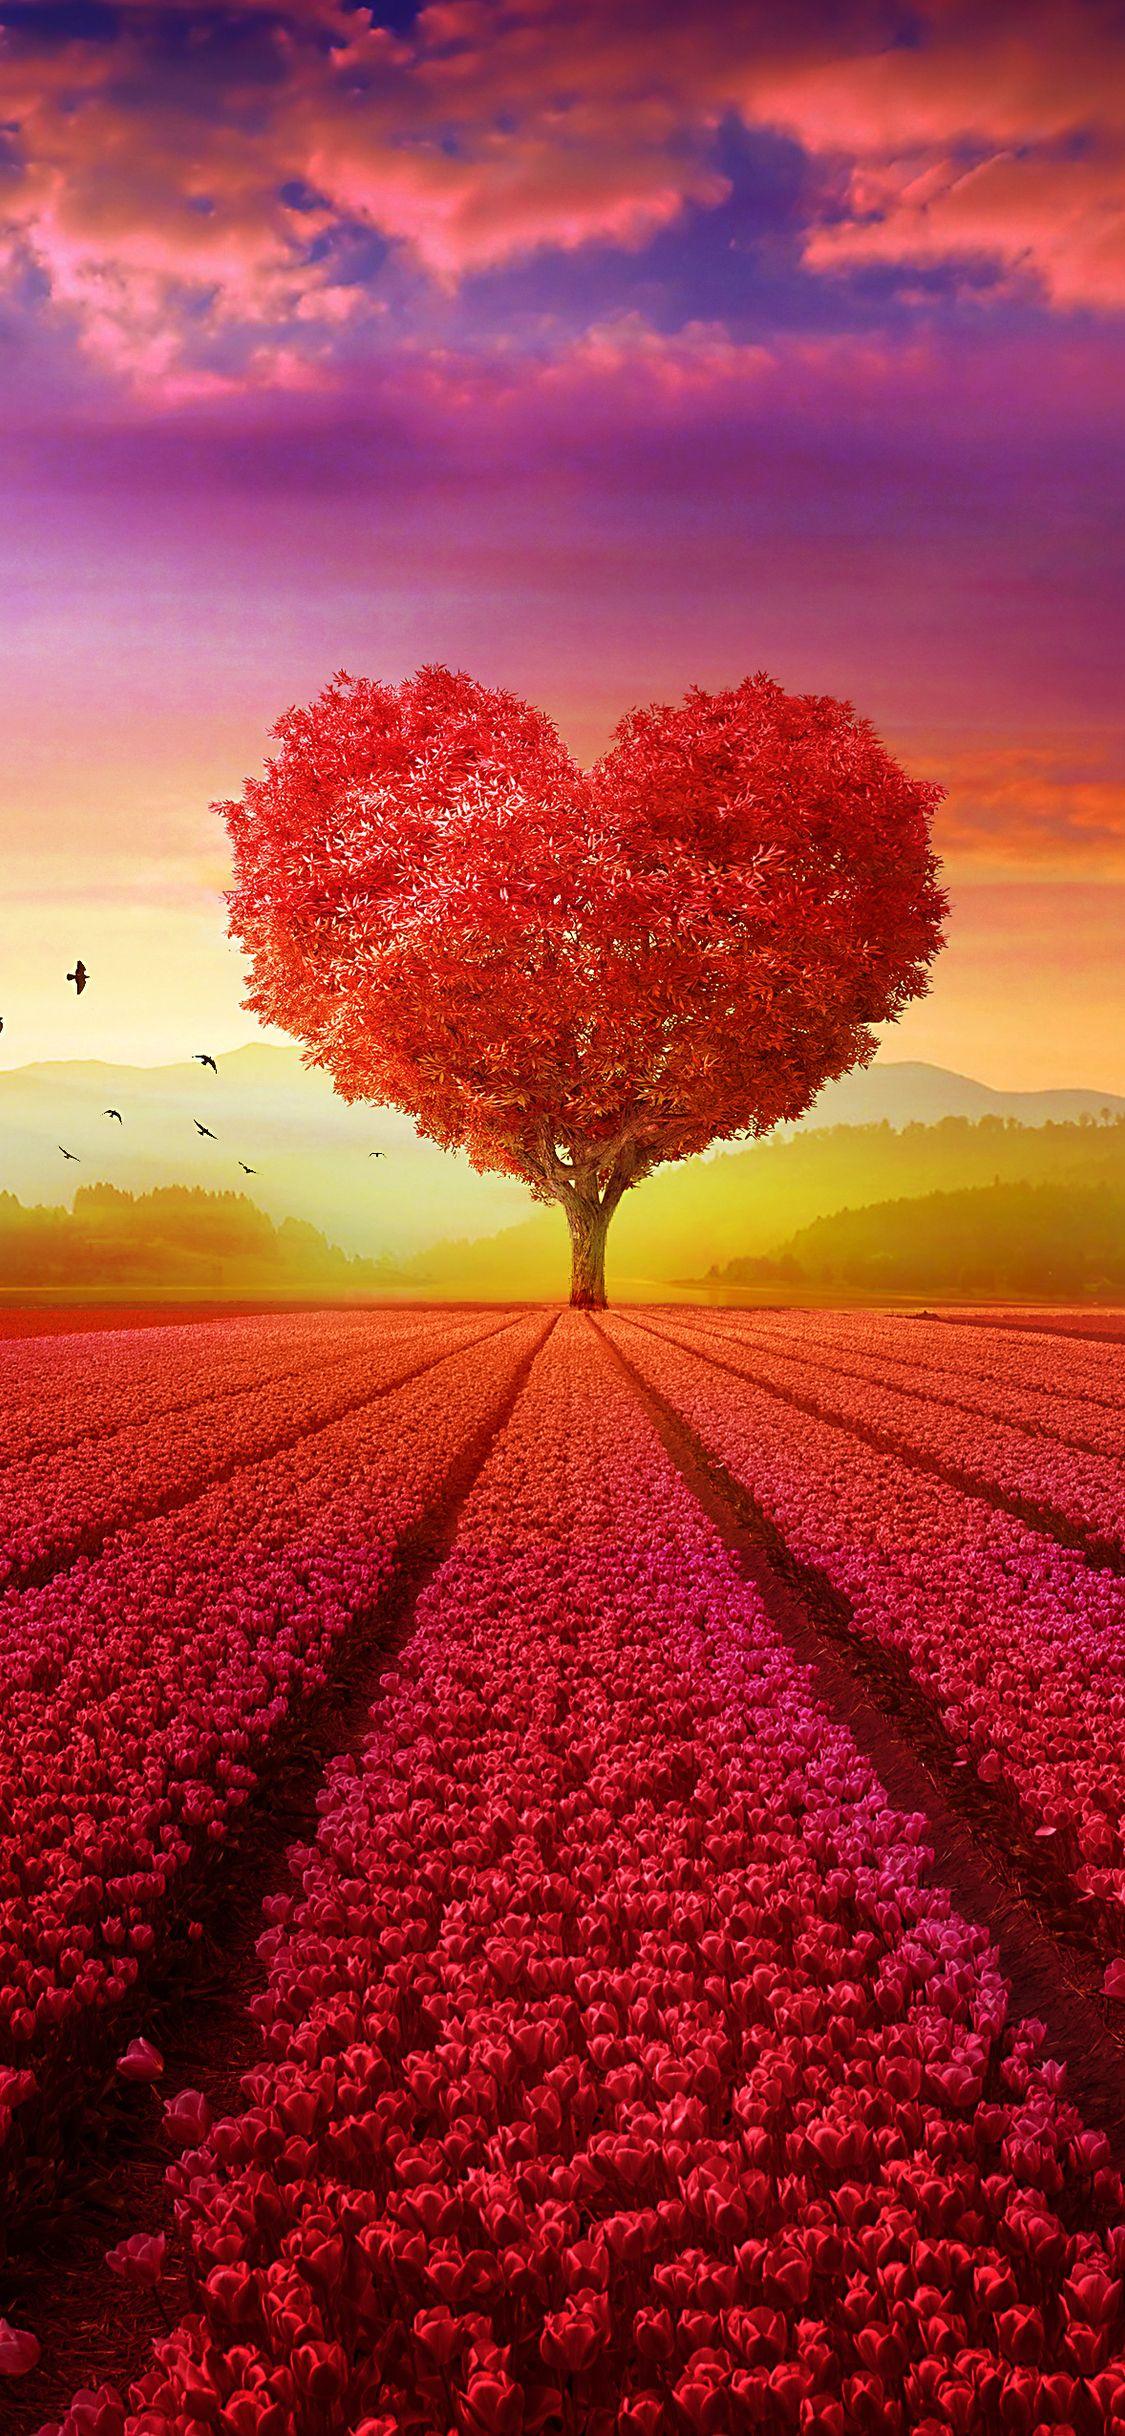 Desktophdwallpaper Org Beautiful Landscape Wallpaper Tree Wallpaper Backgrounds Tree Wallpaper Iphone